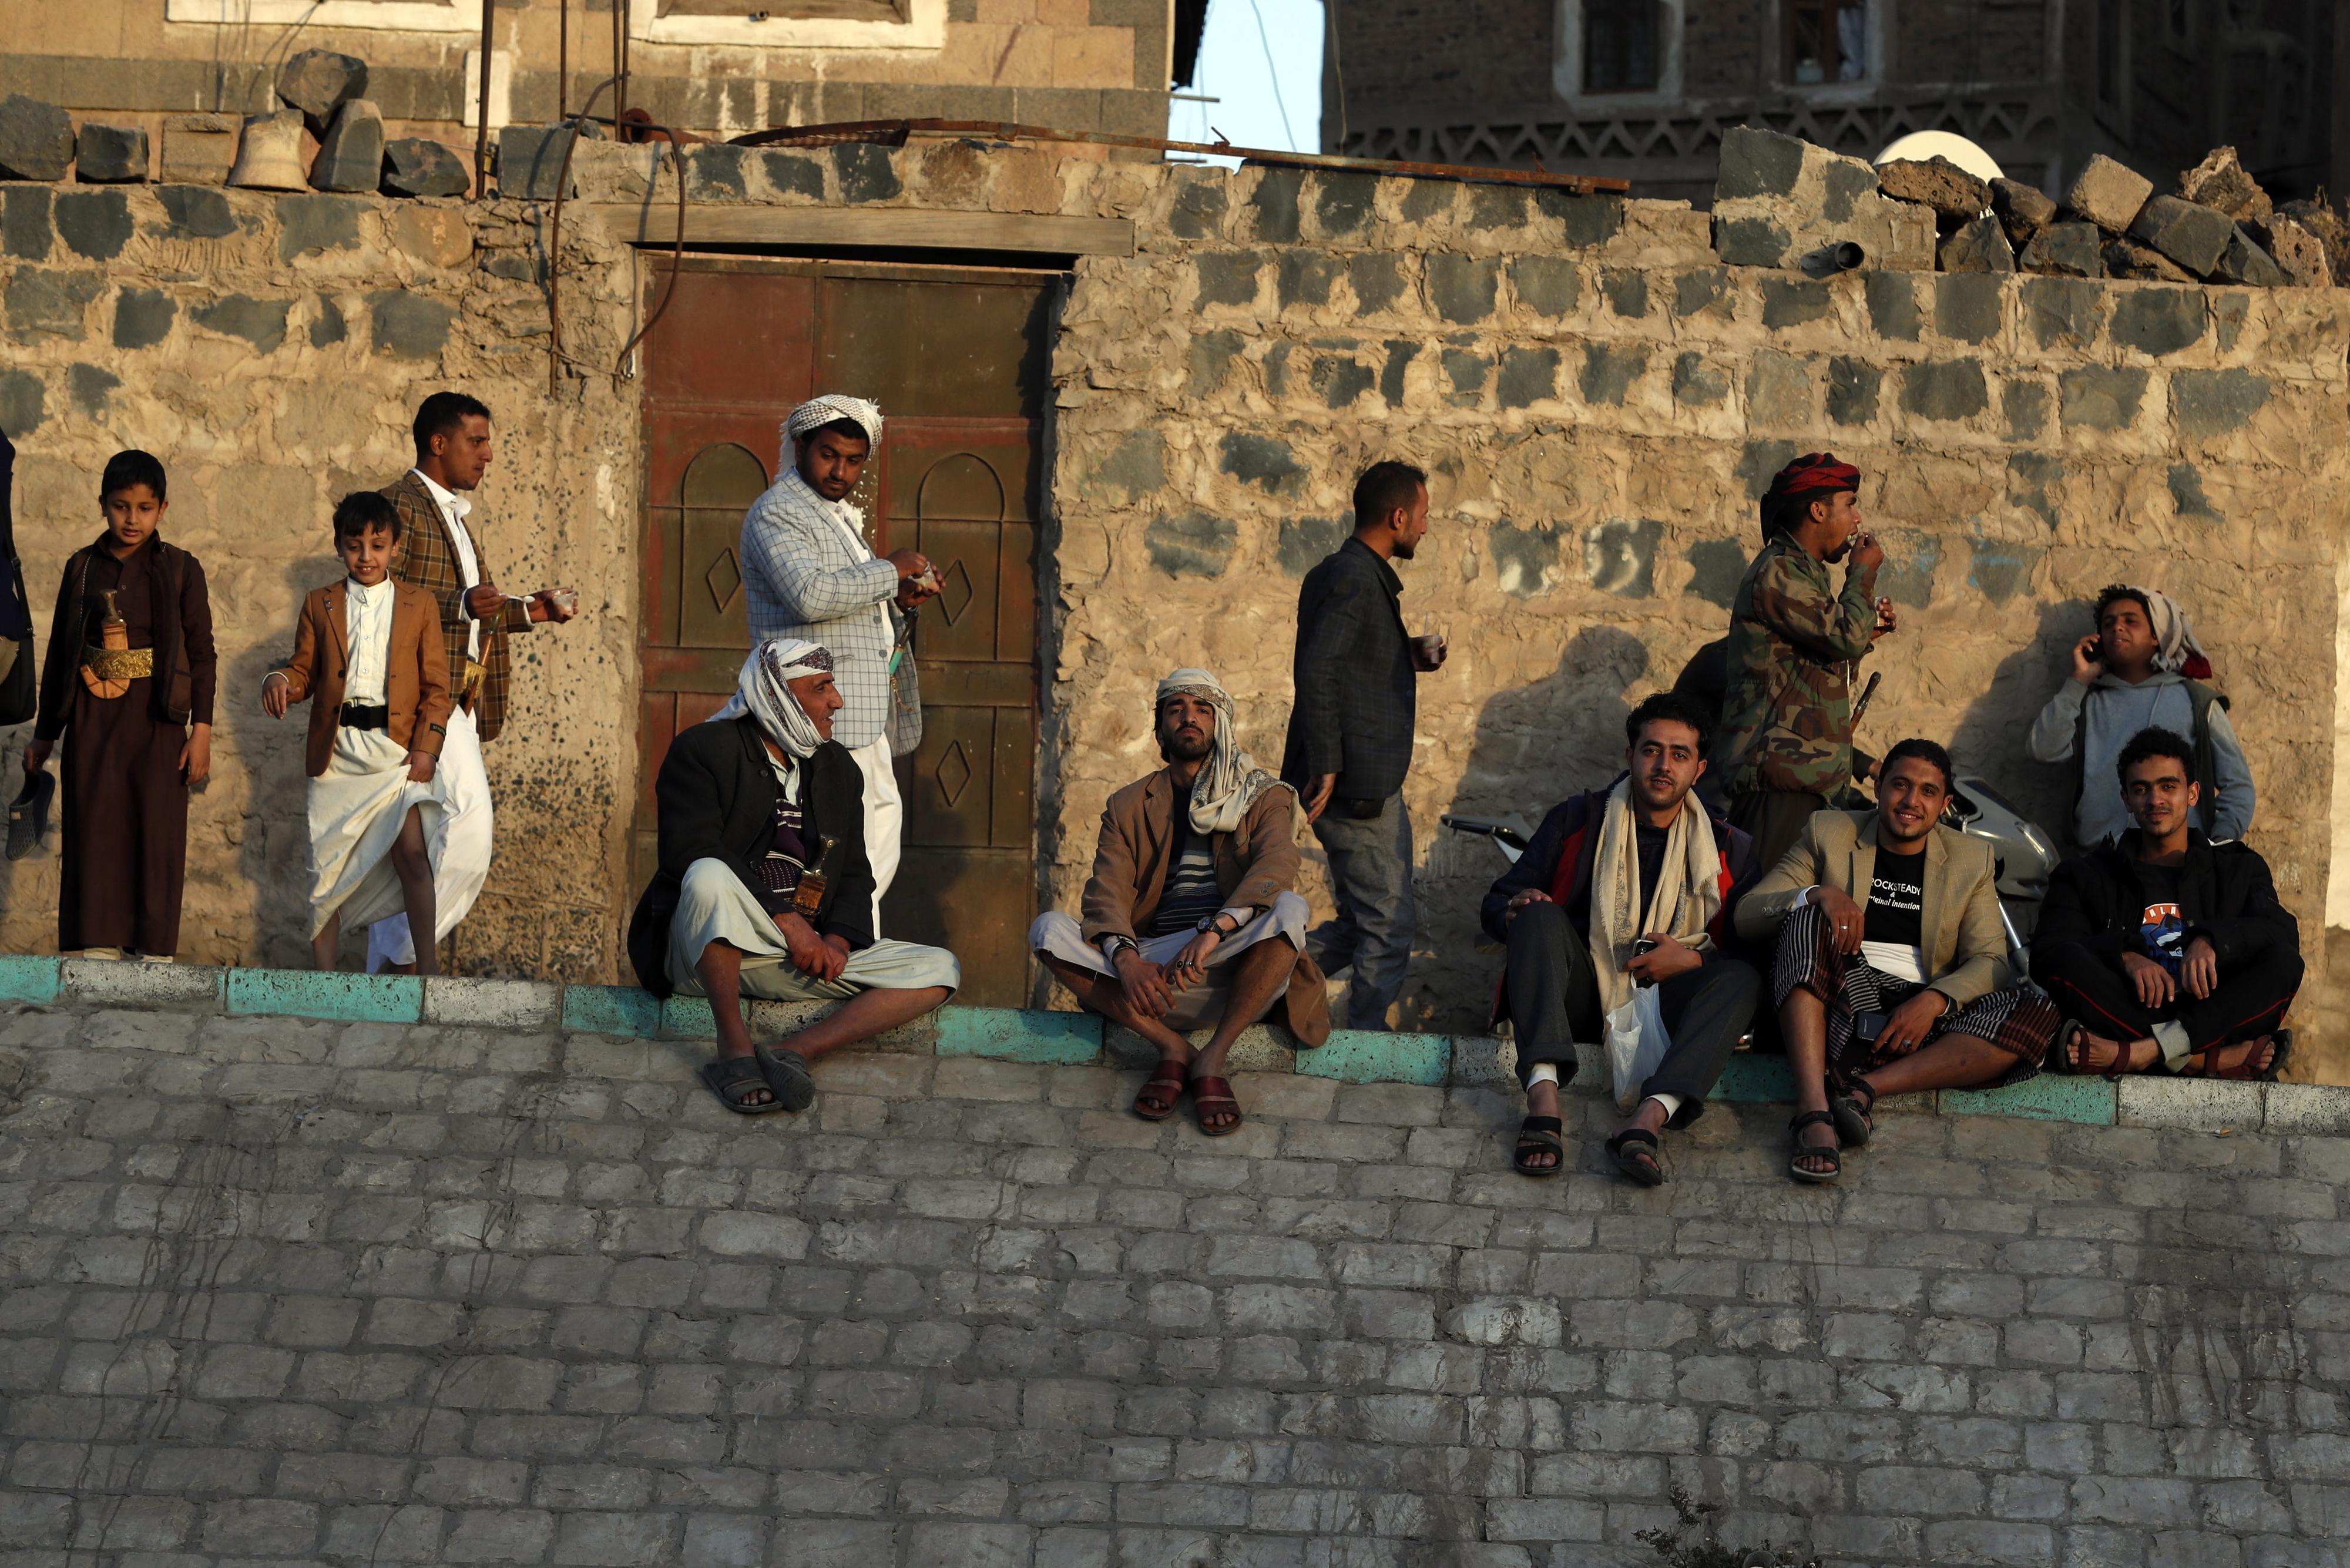 Ataque de rebeldes com míssil mata pelo menos 25 soldados no Iémen